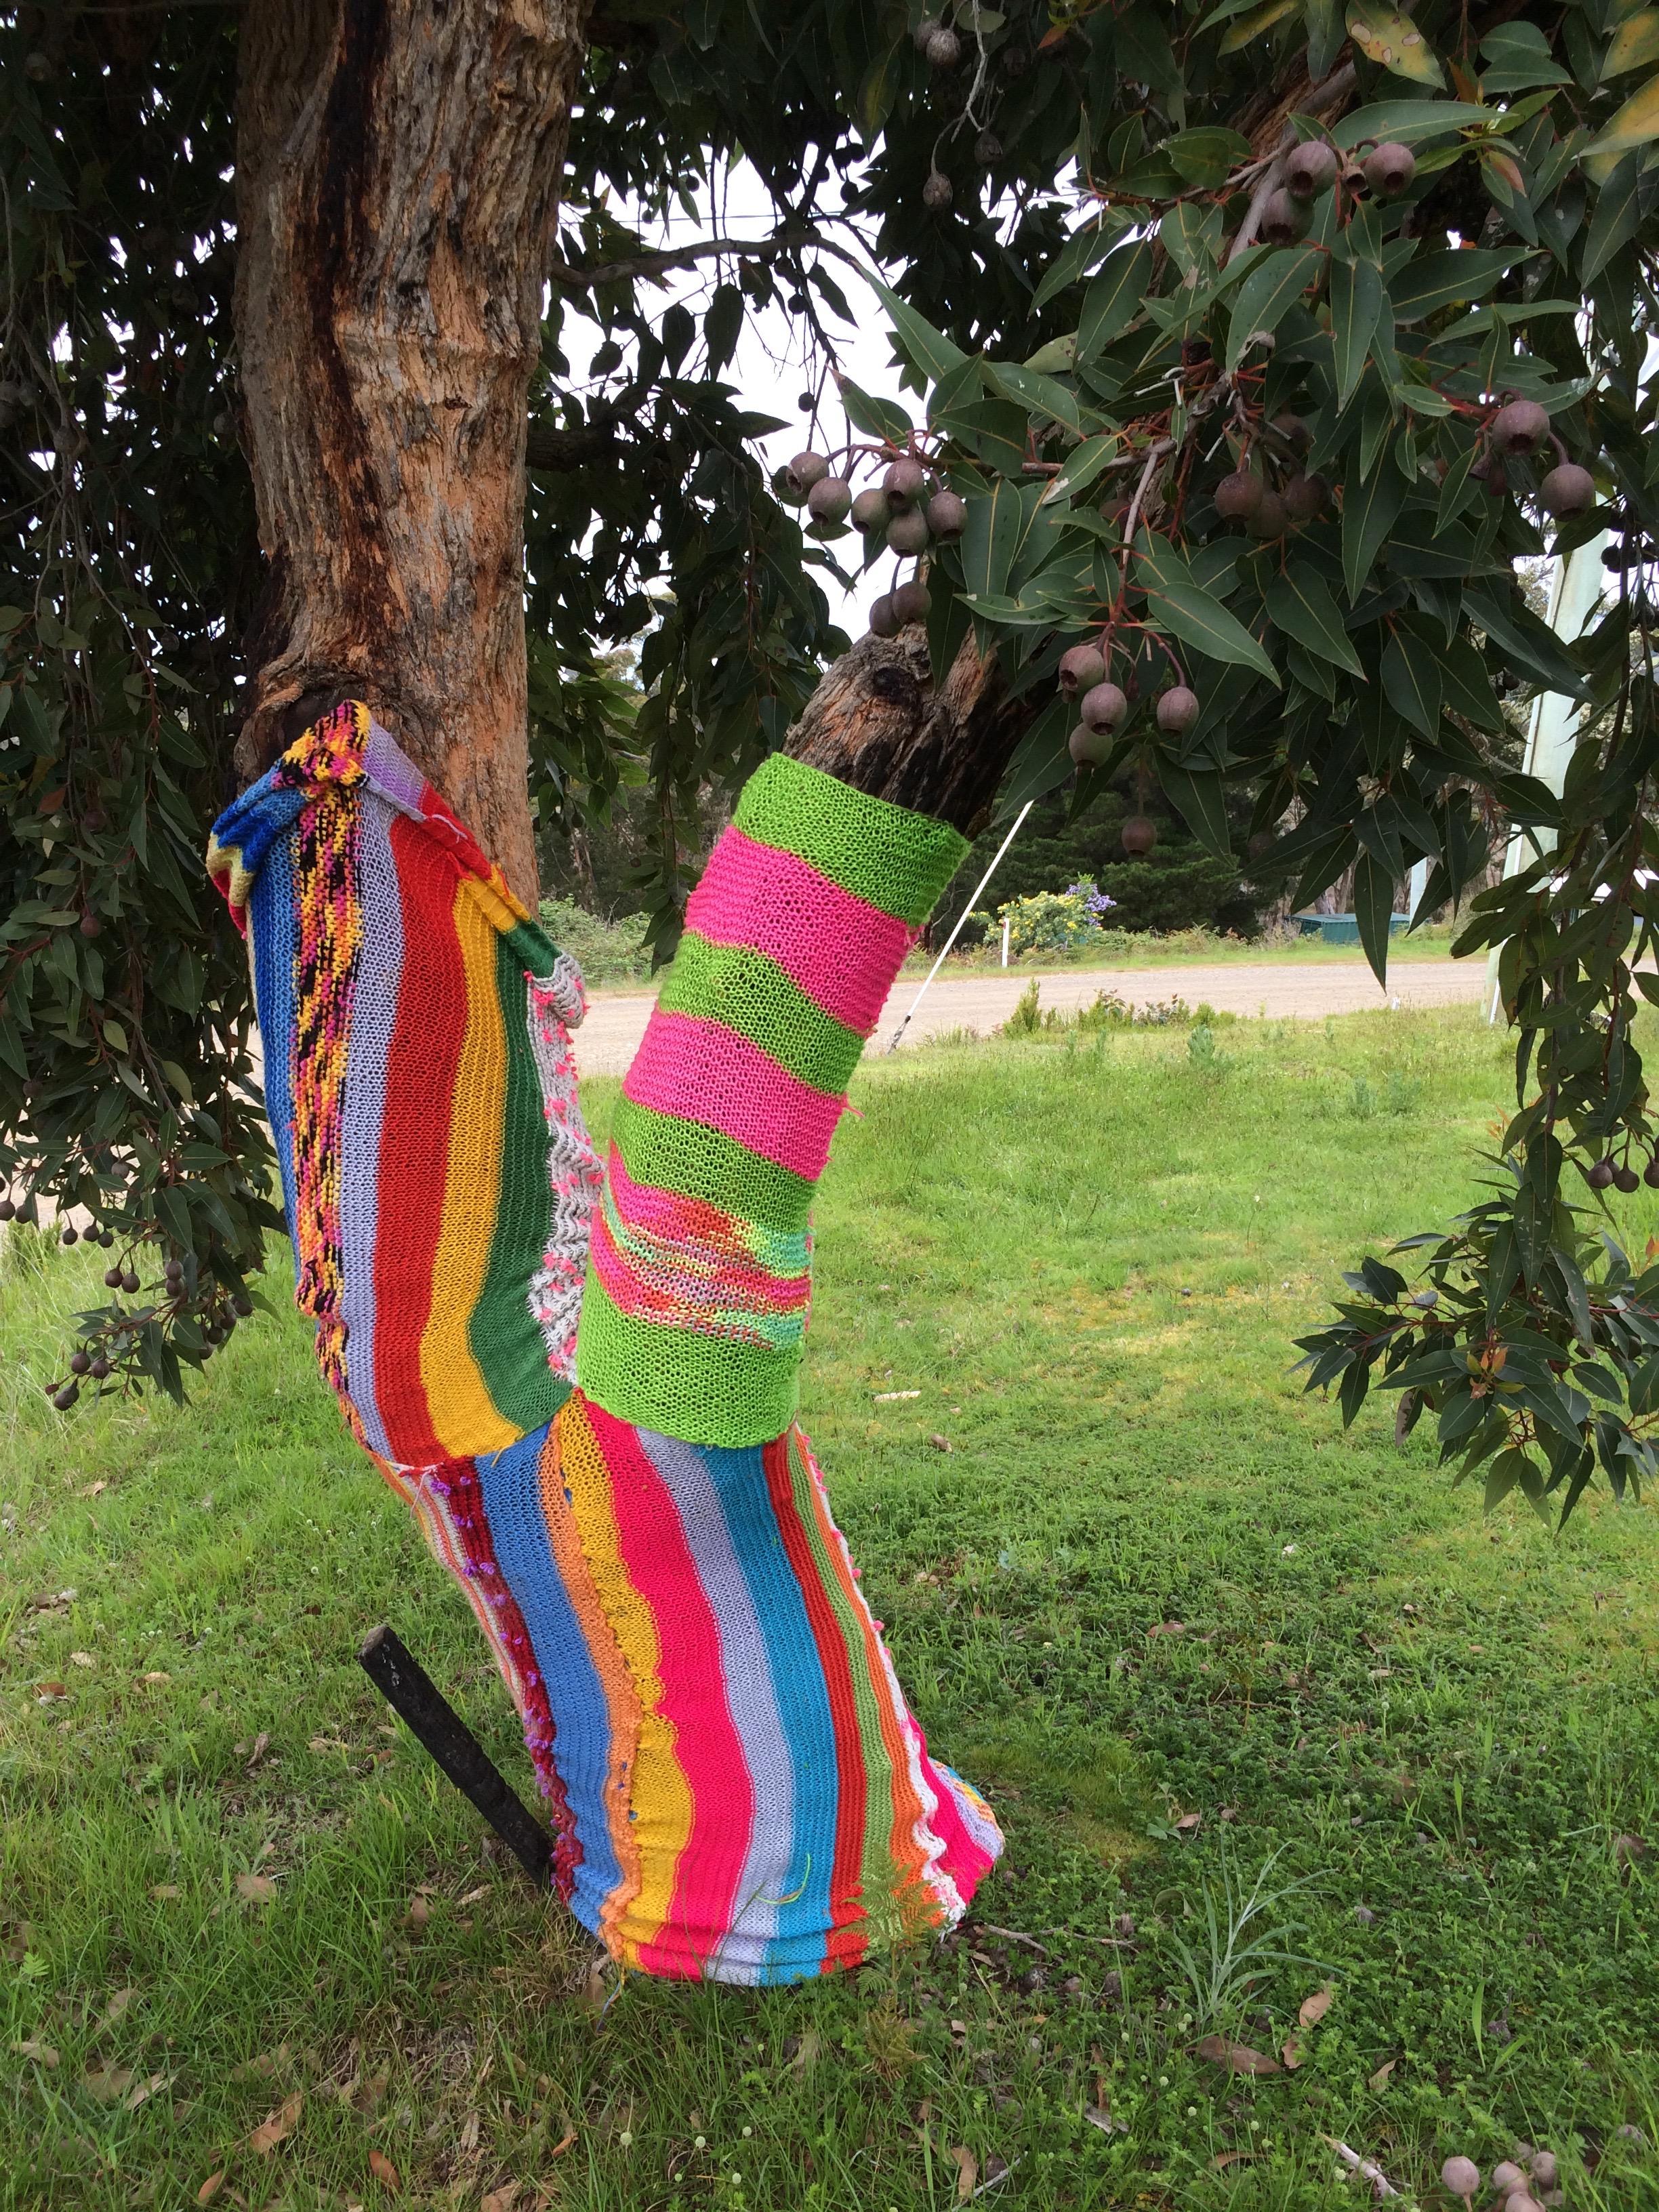 yarn bombing bench - photo #14